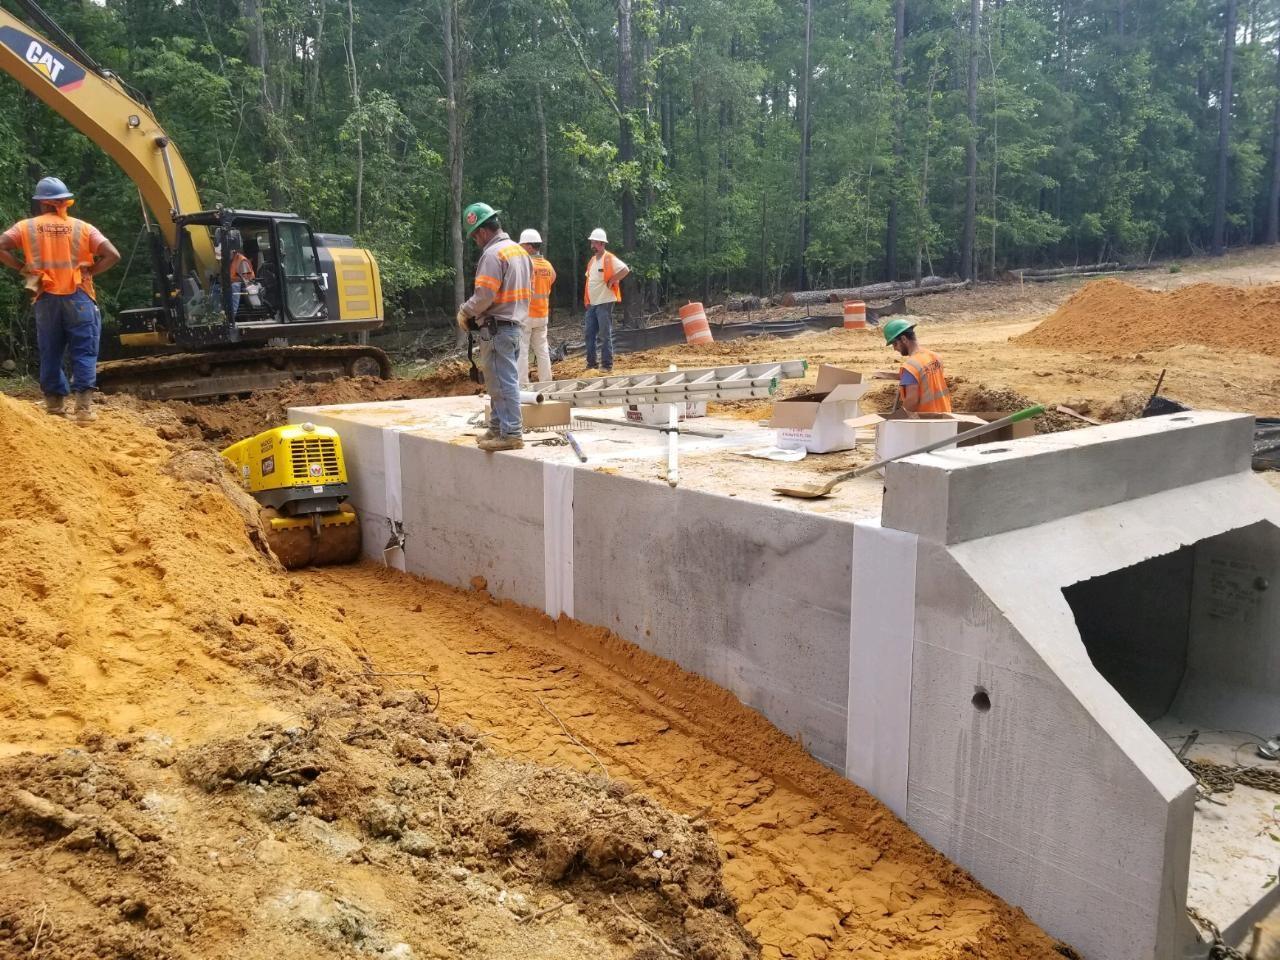 Johns Creek Roadway Improvements